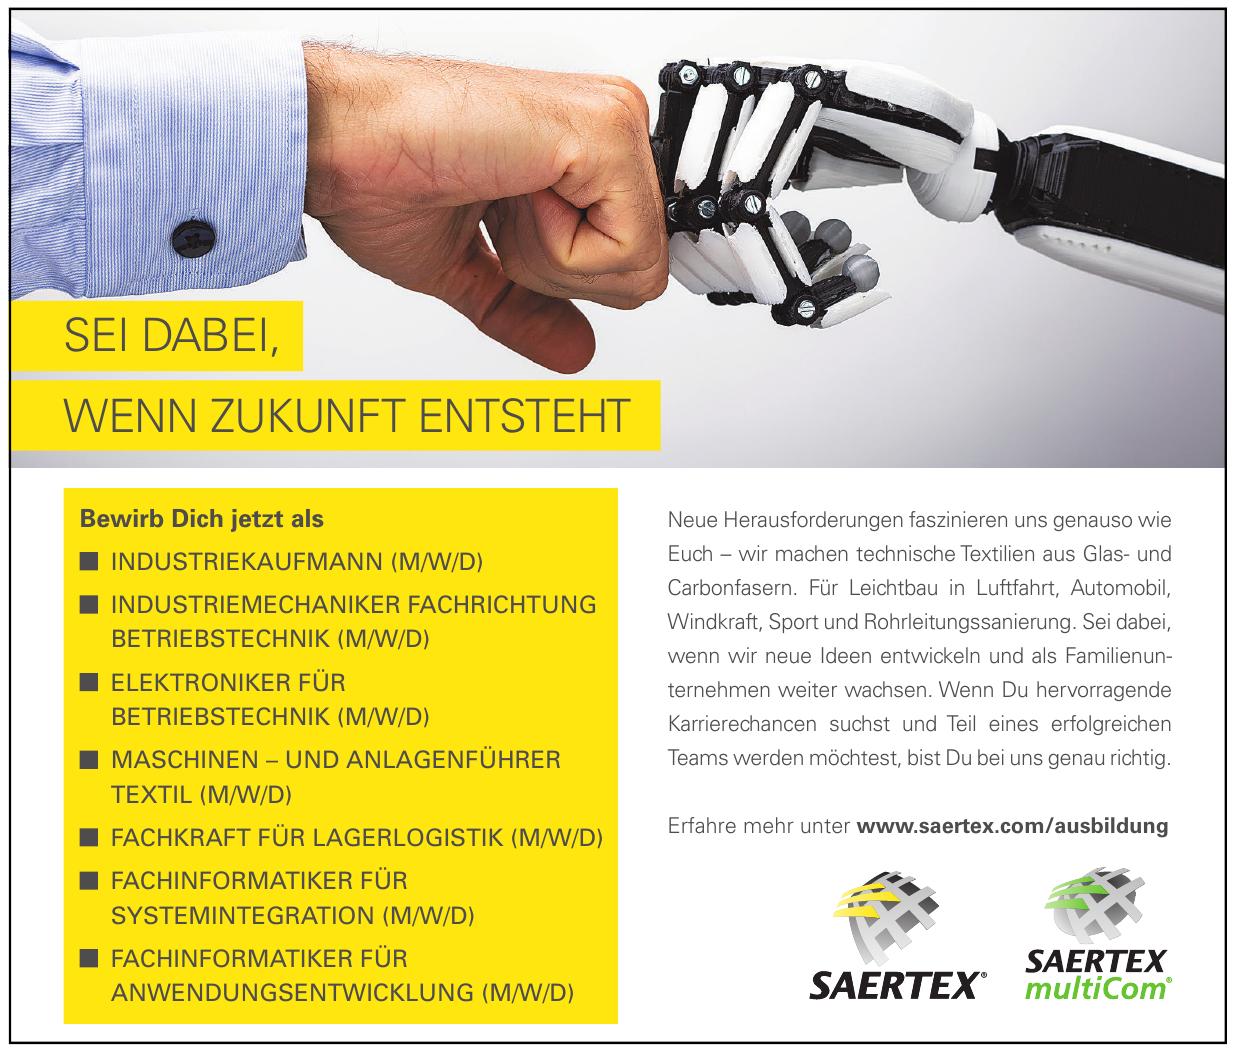 Saertex GmbH & Co. KG